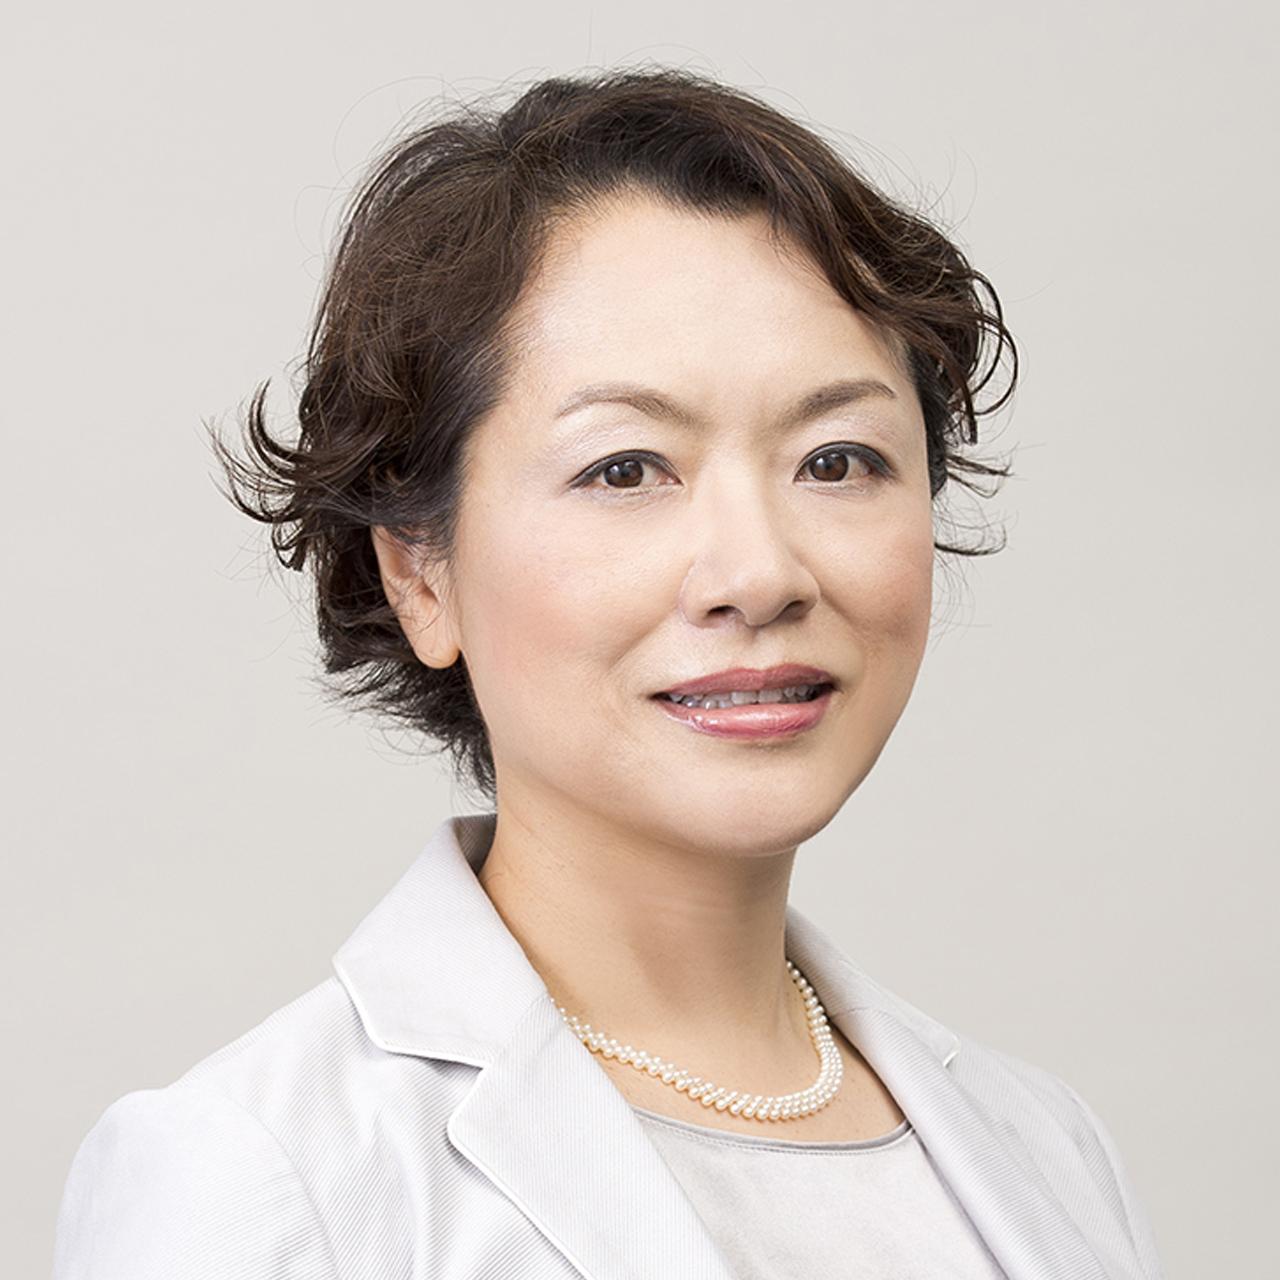 Ikuyo Namigata